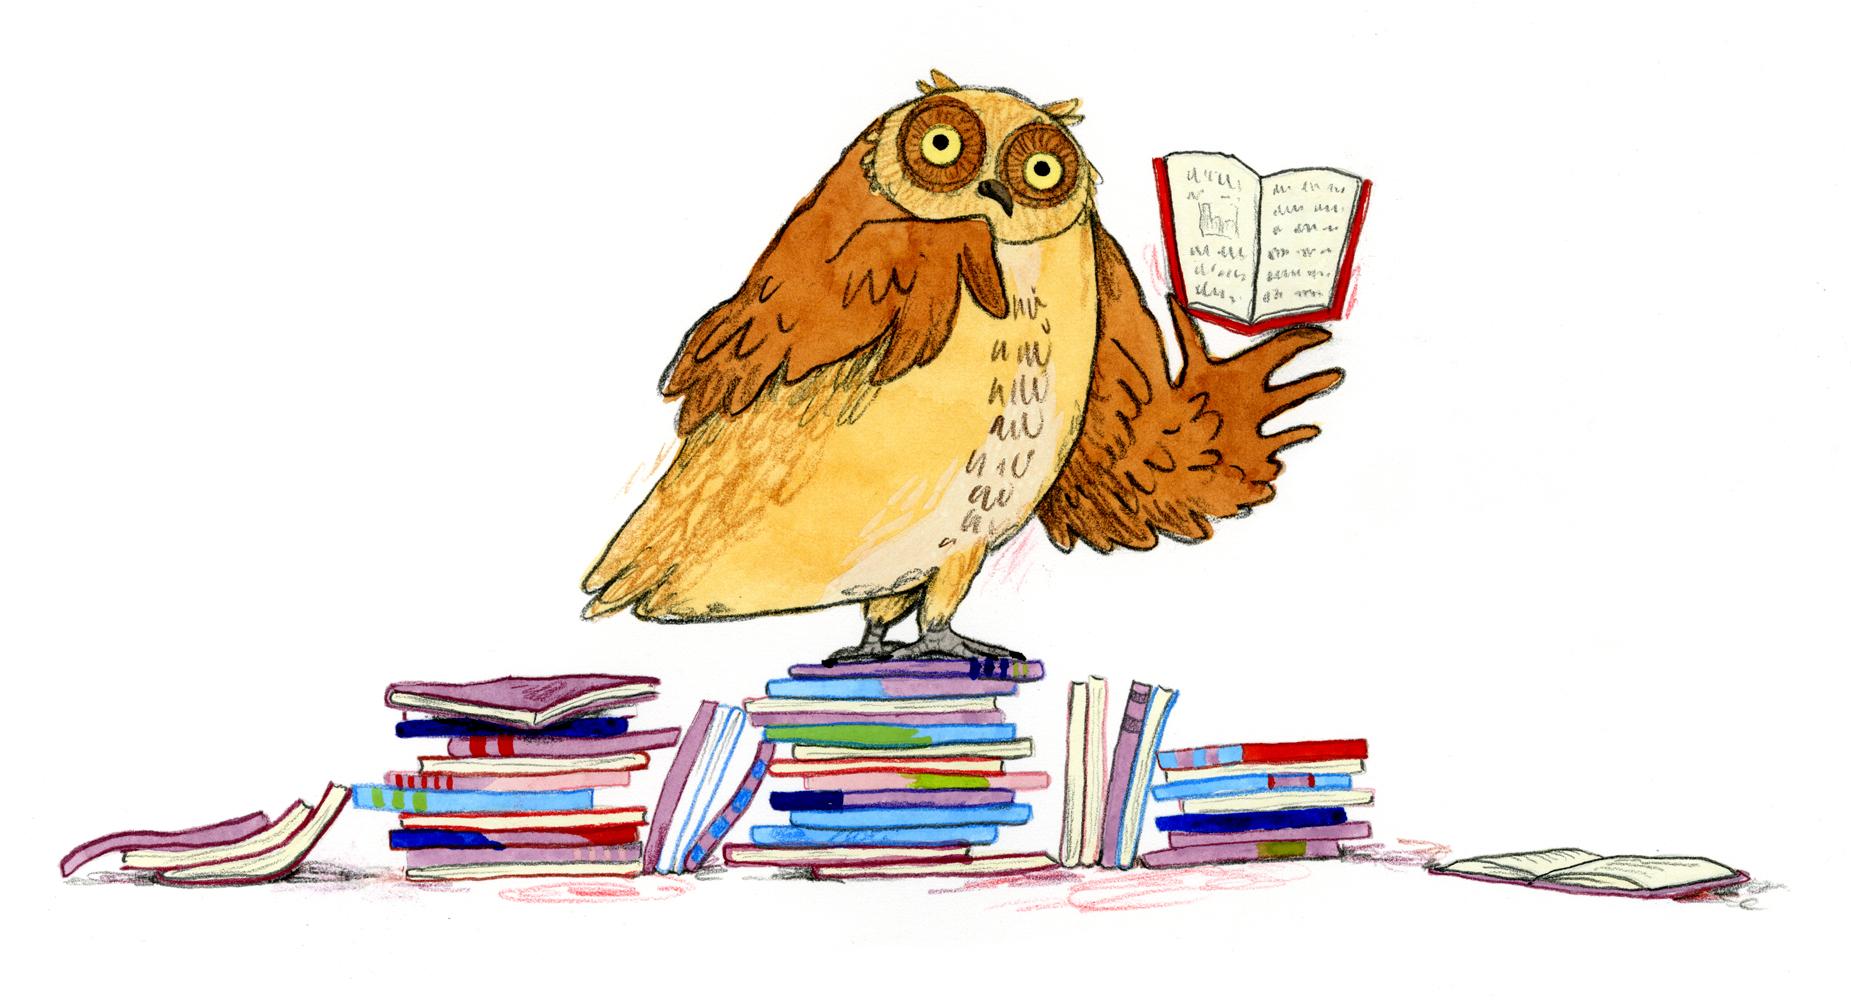 06 Farley Junior Great Books owl.jpg